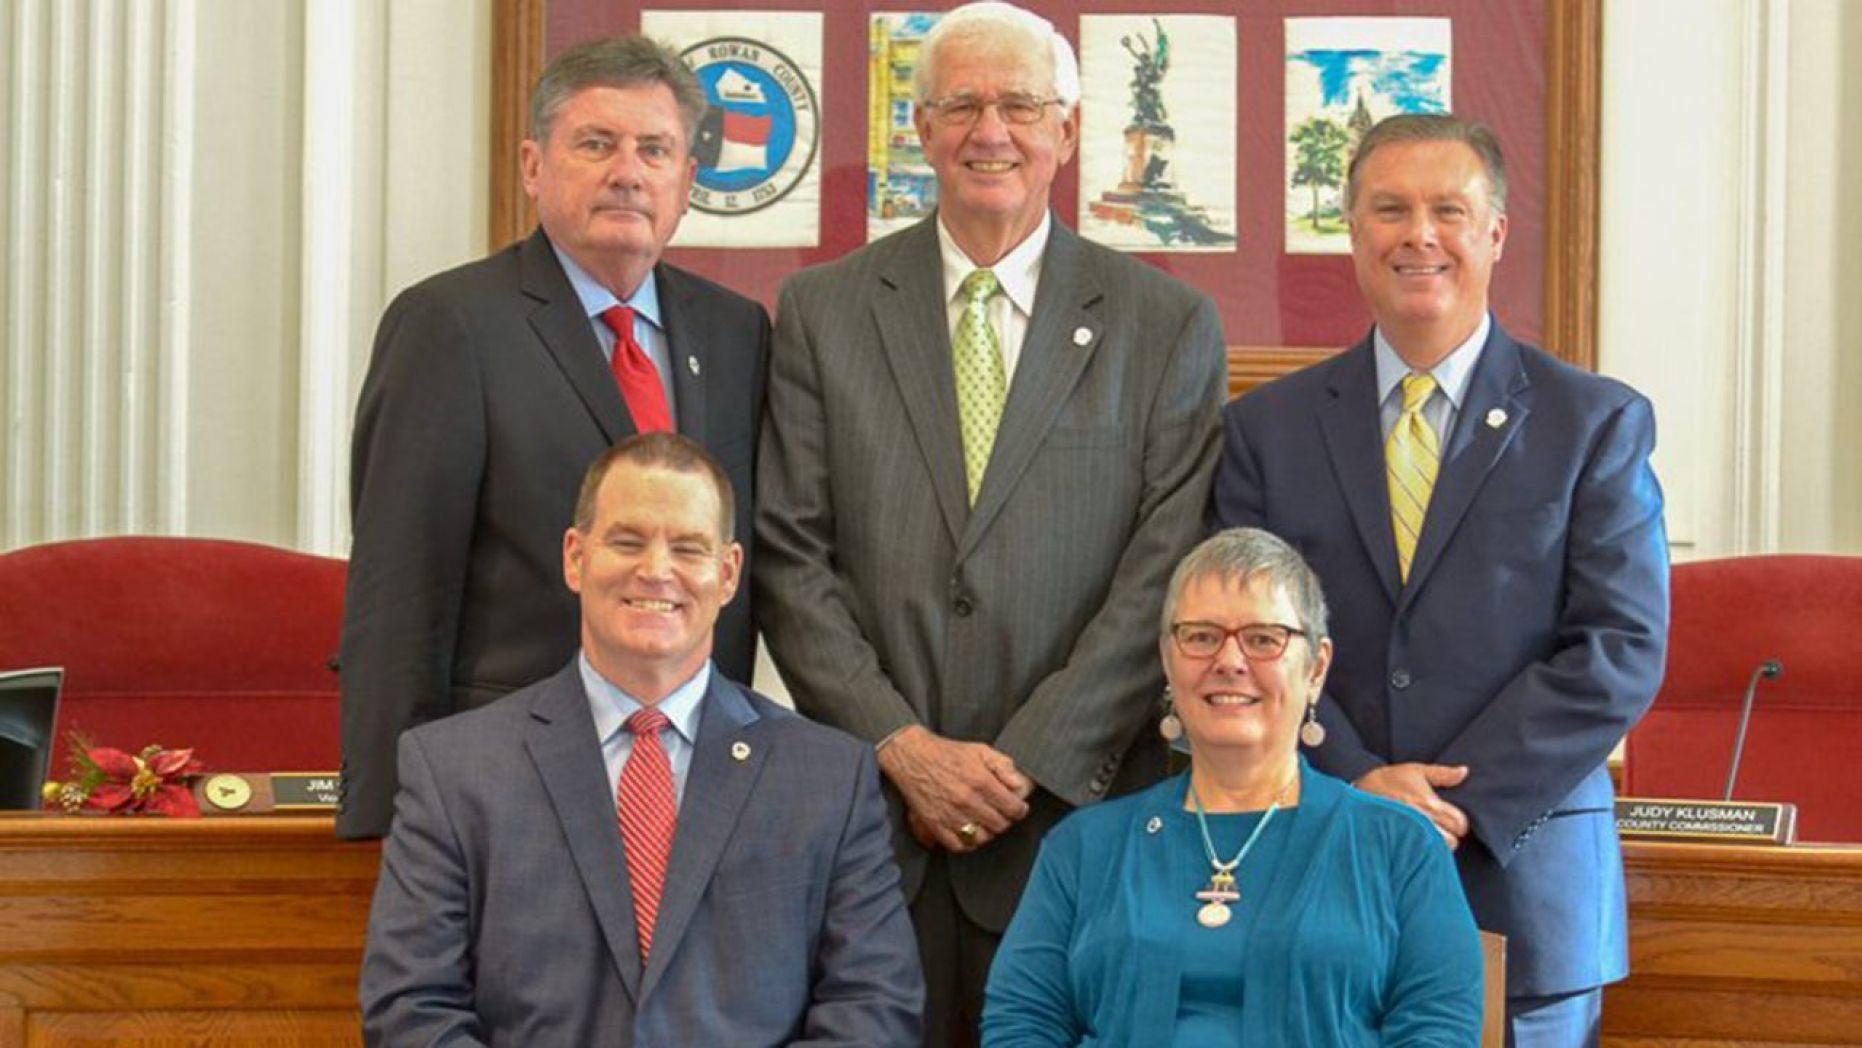 Rowan County commissioners in North Carolina